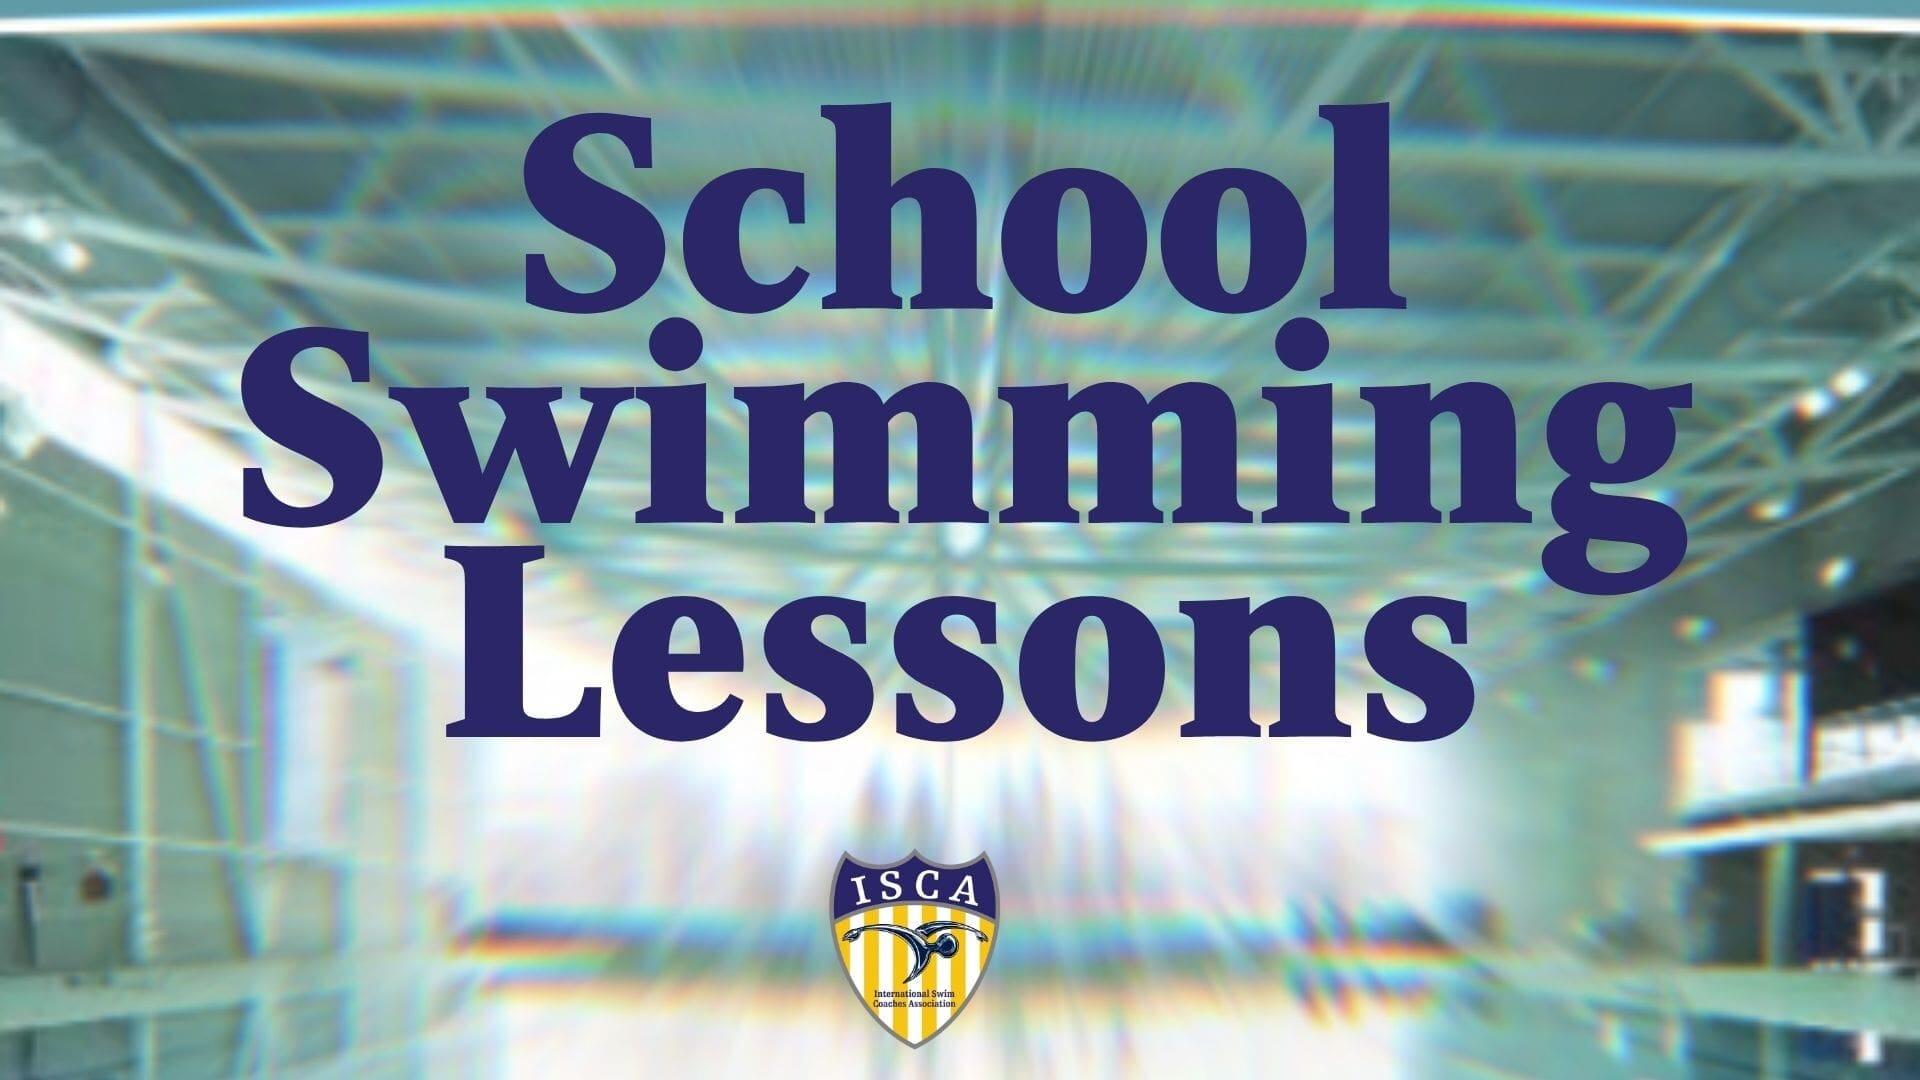 School Swimming Lessons